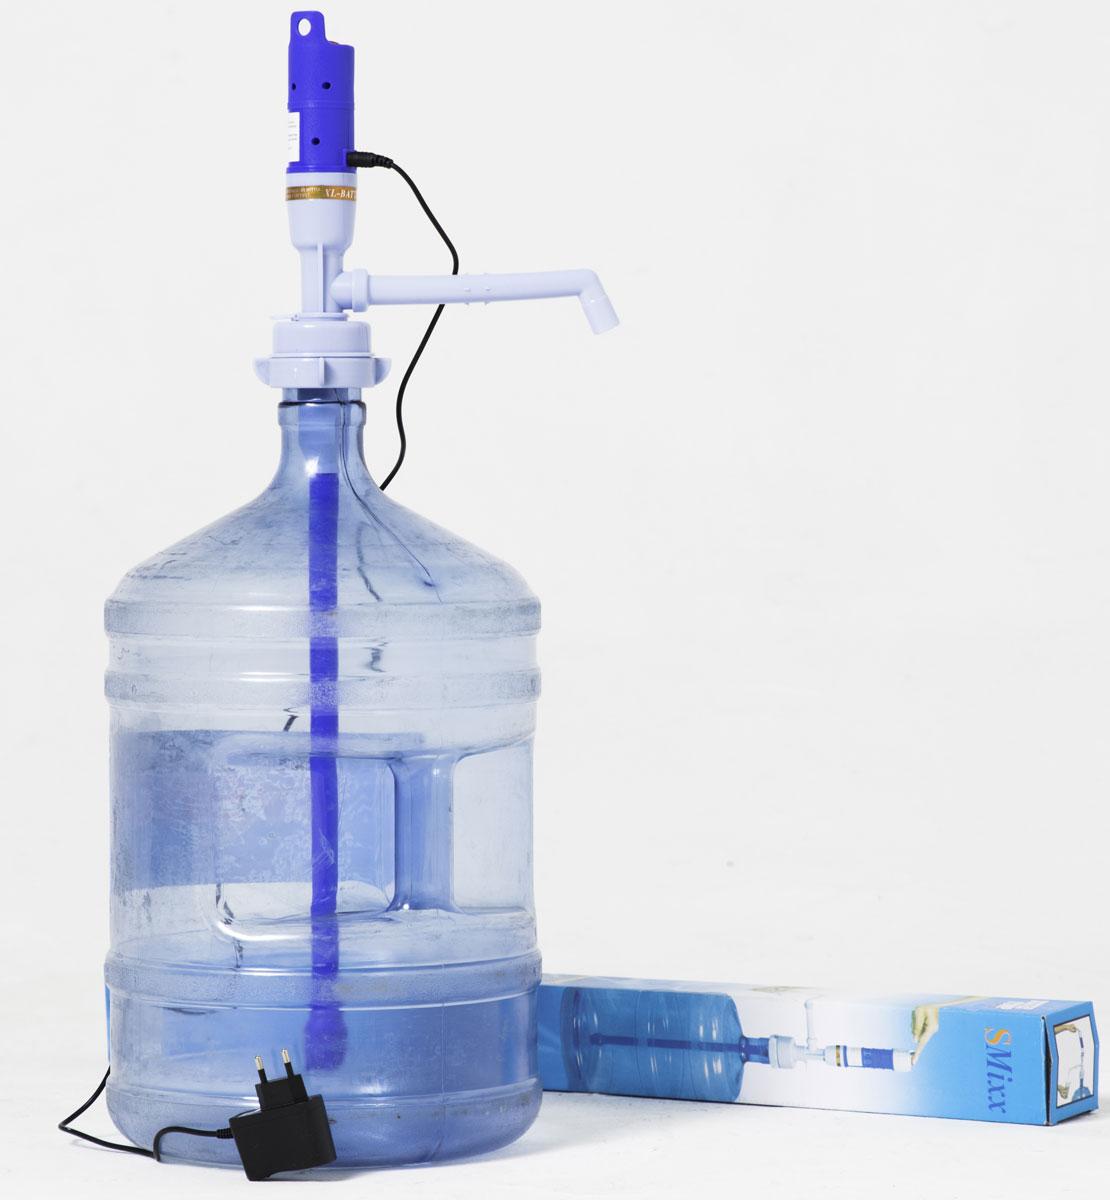 SMixx Xl-D2, Grey Blue электрическая помпа для воды